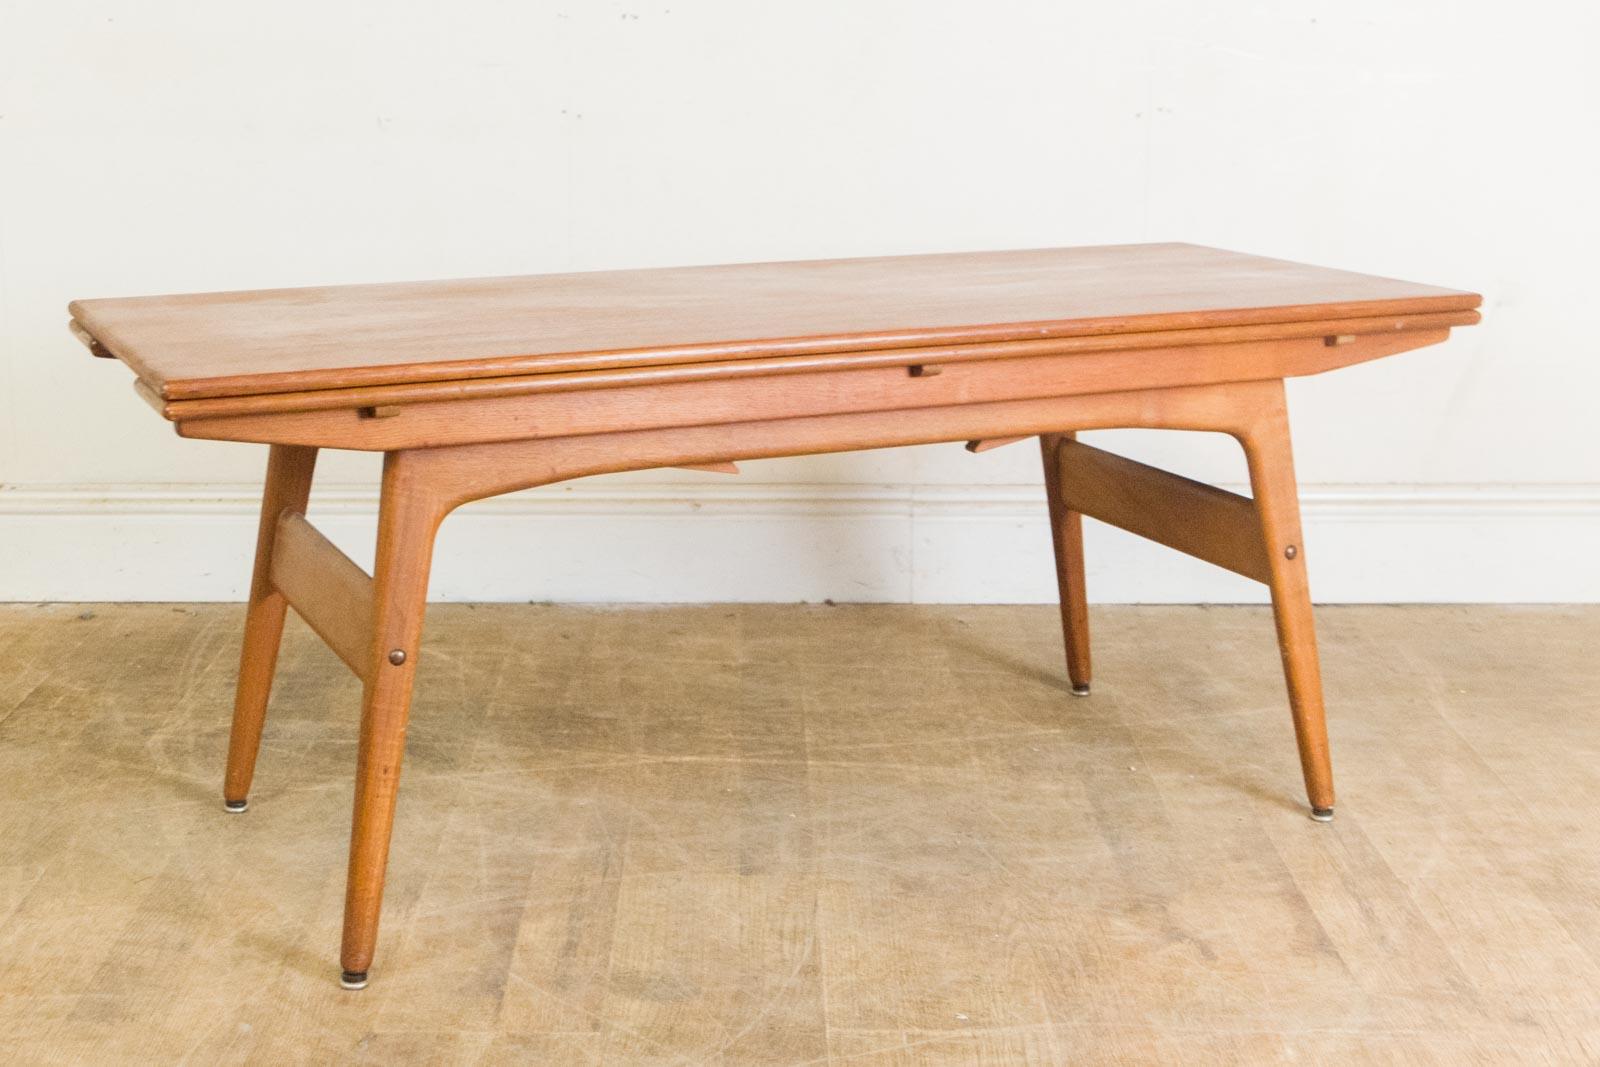 vintage retro trioh metamorphic teak coffee table dining table ebay. Black Bedroom Furniture Sets. Home Design Ideas